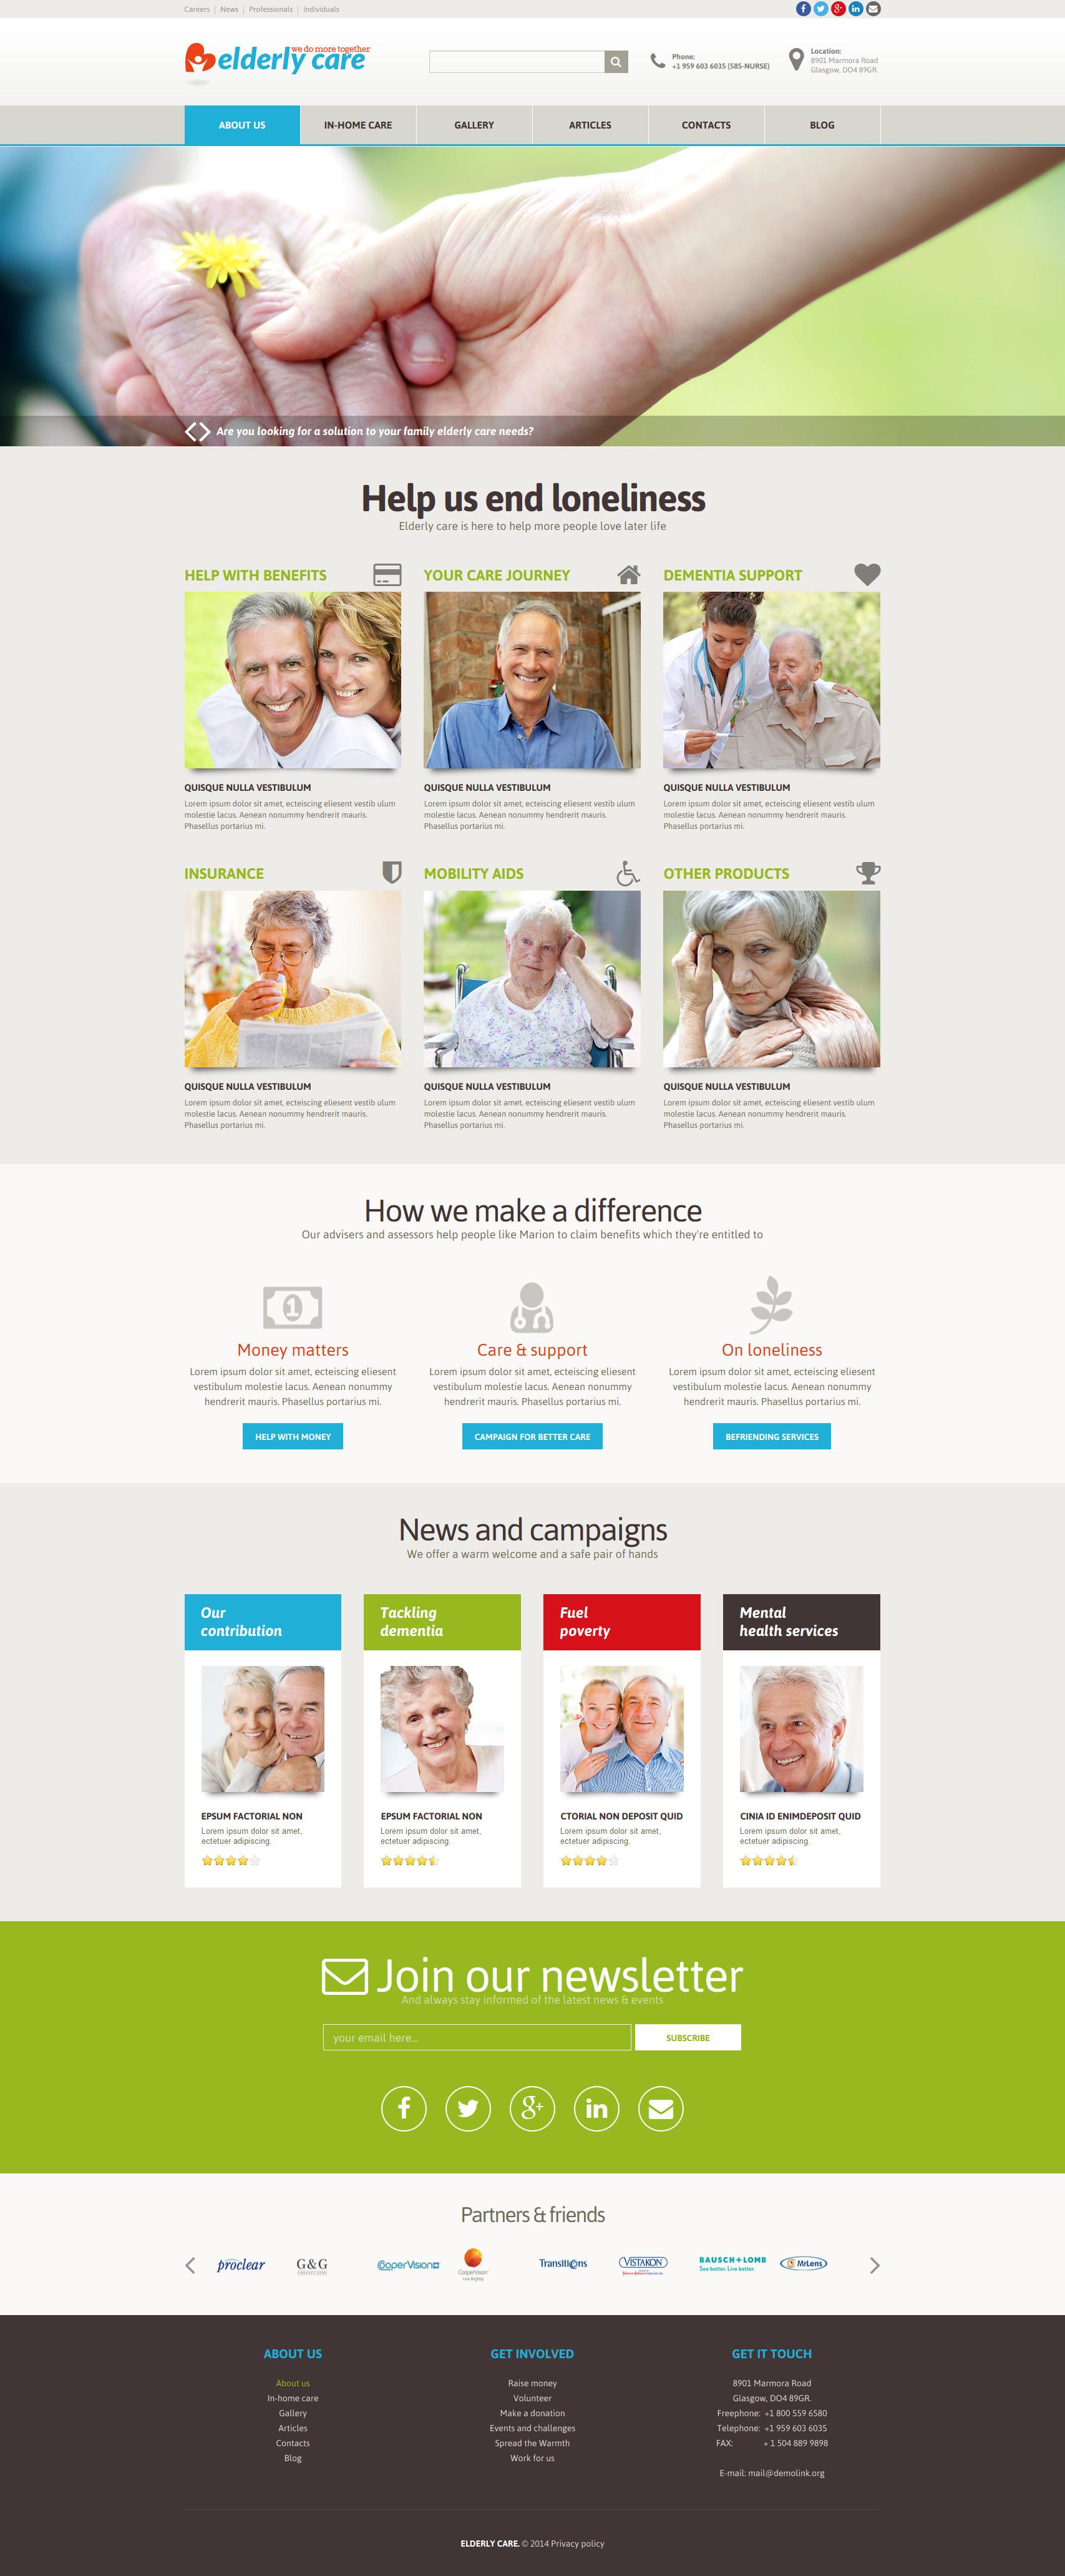 Responsywny szablon Joomla Elderly Care #51801